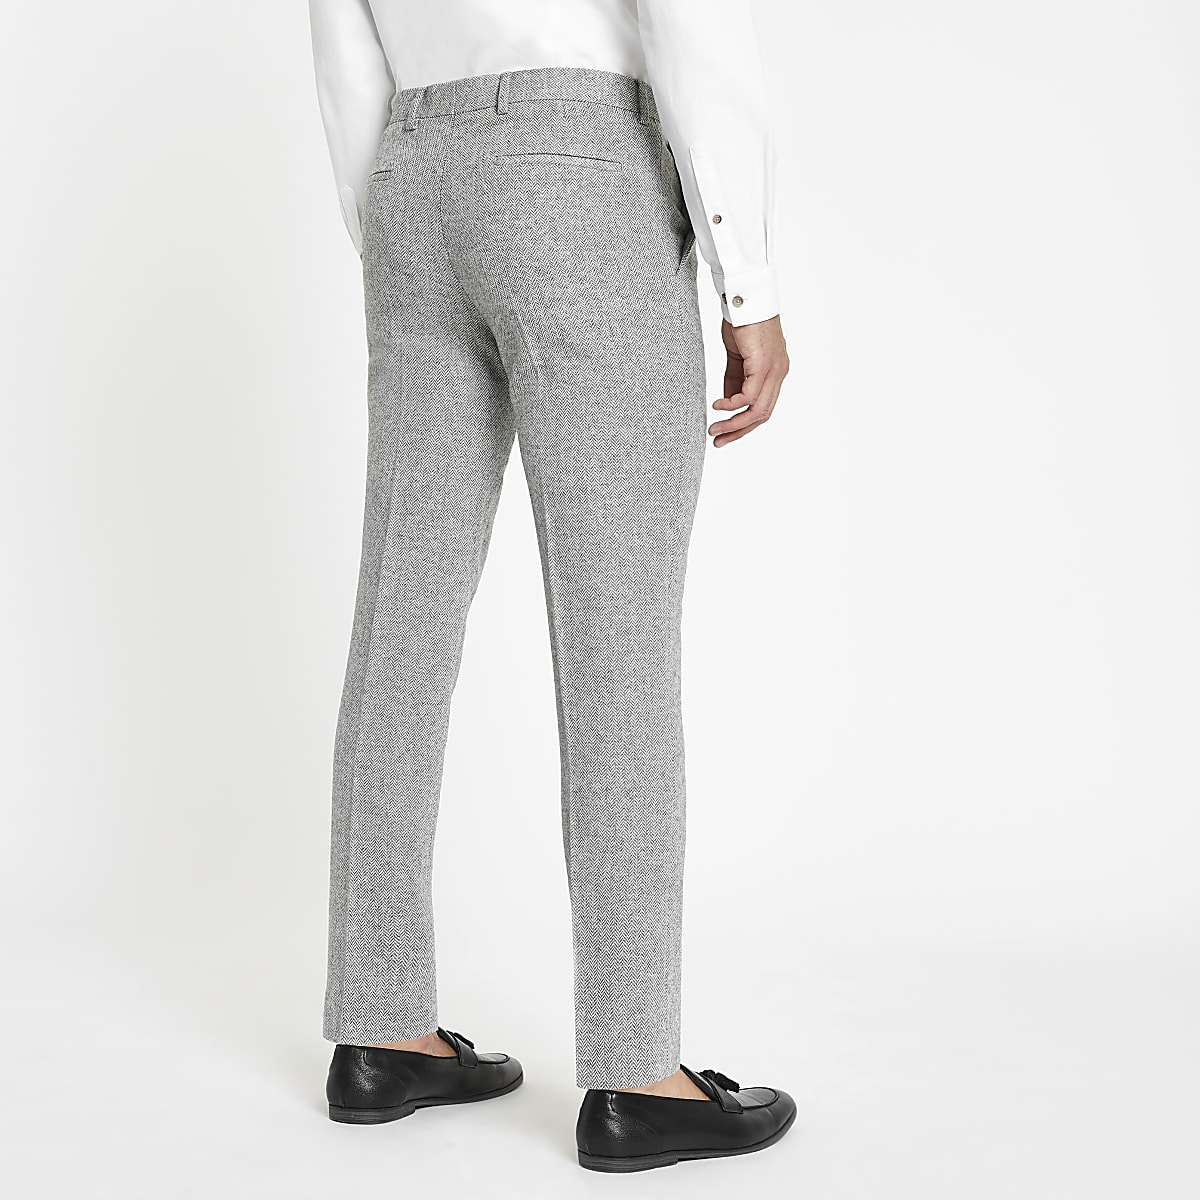 18199d69a7 Grey herringbone skinny fit suit trousers